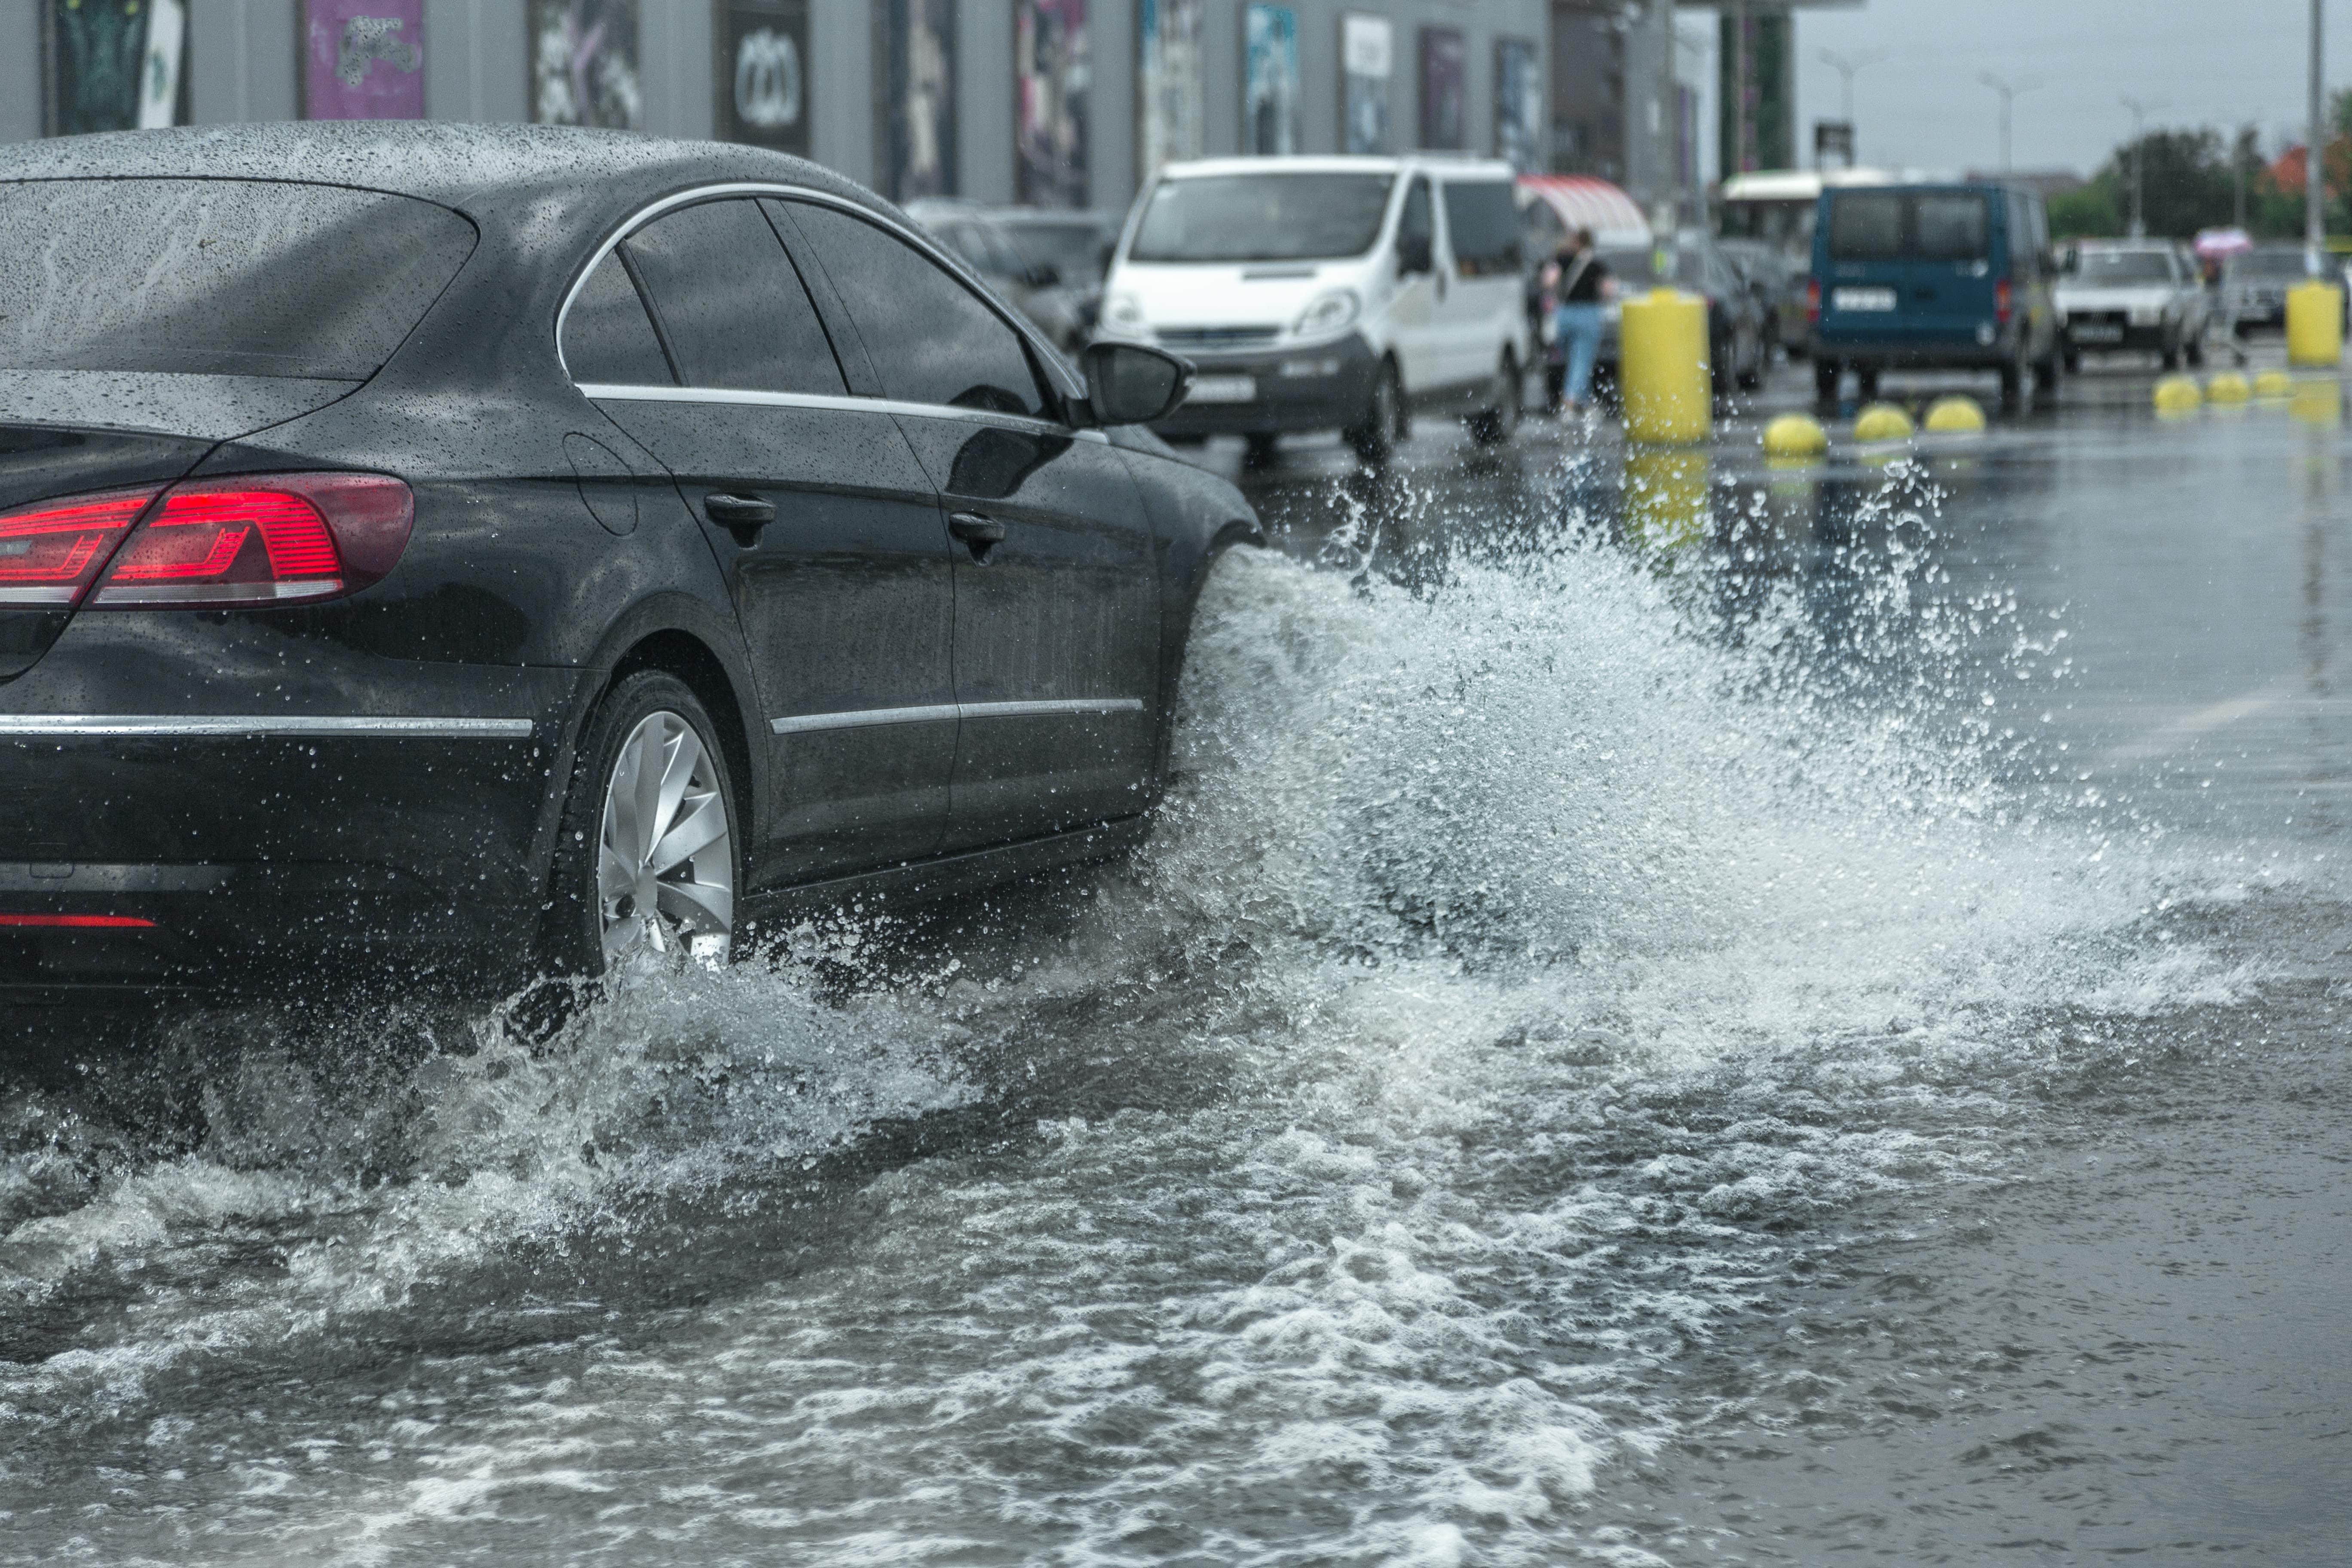 Black car driving through large puddle